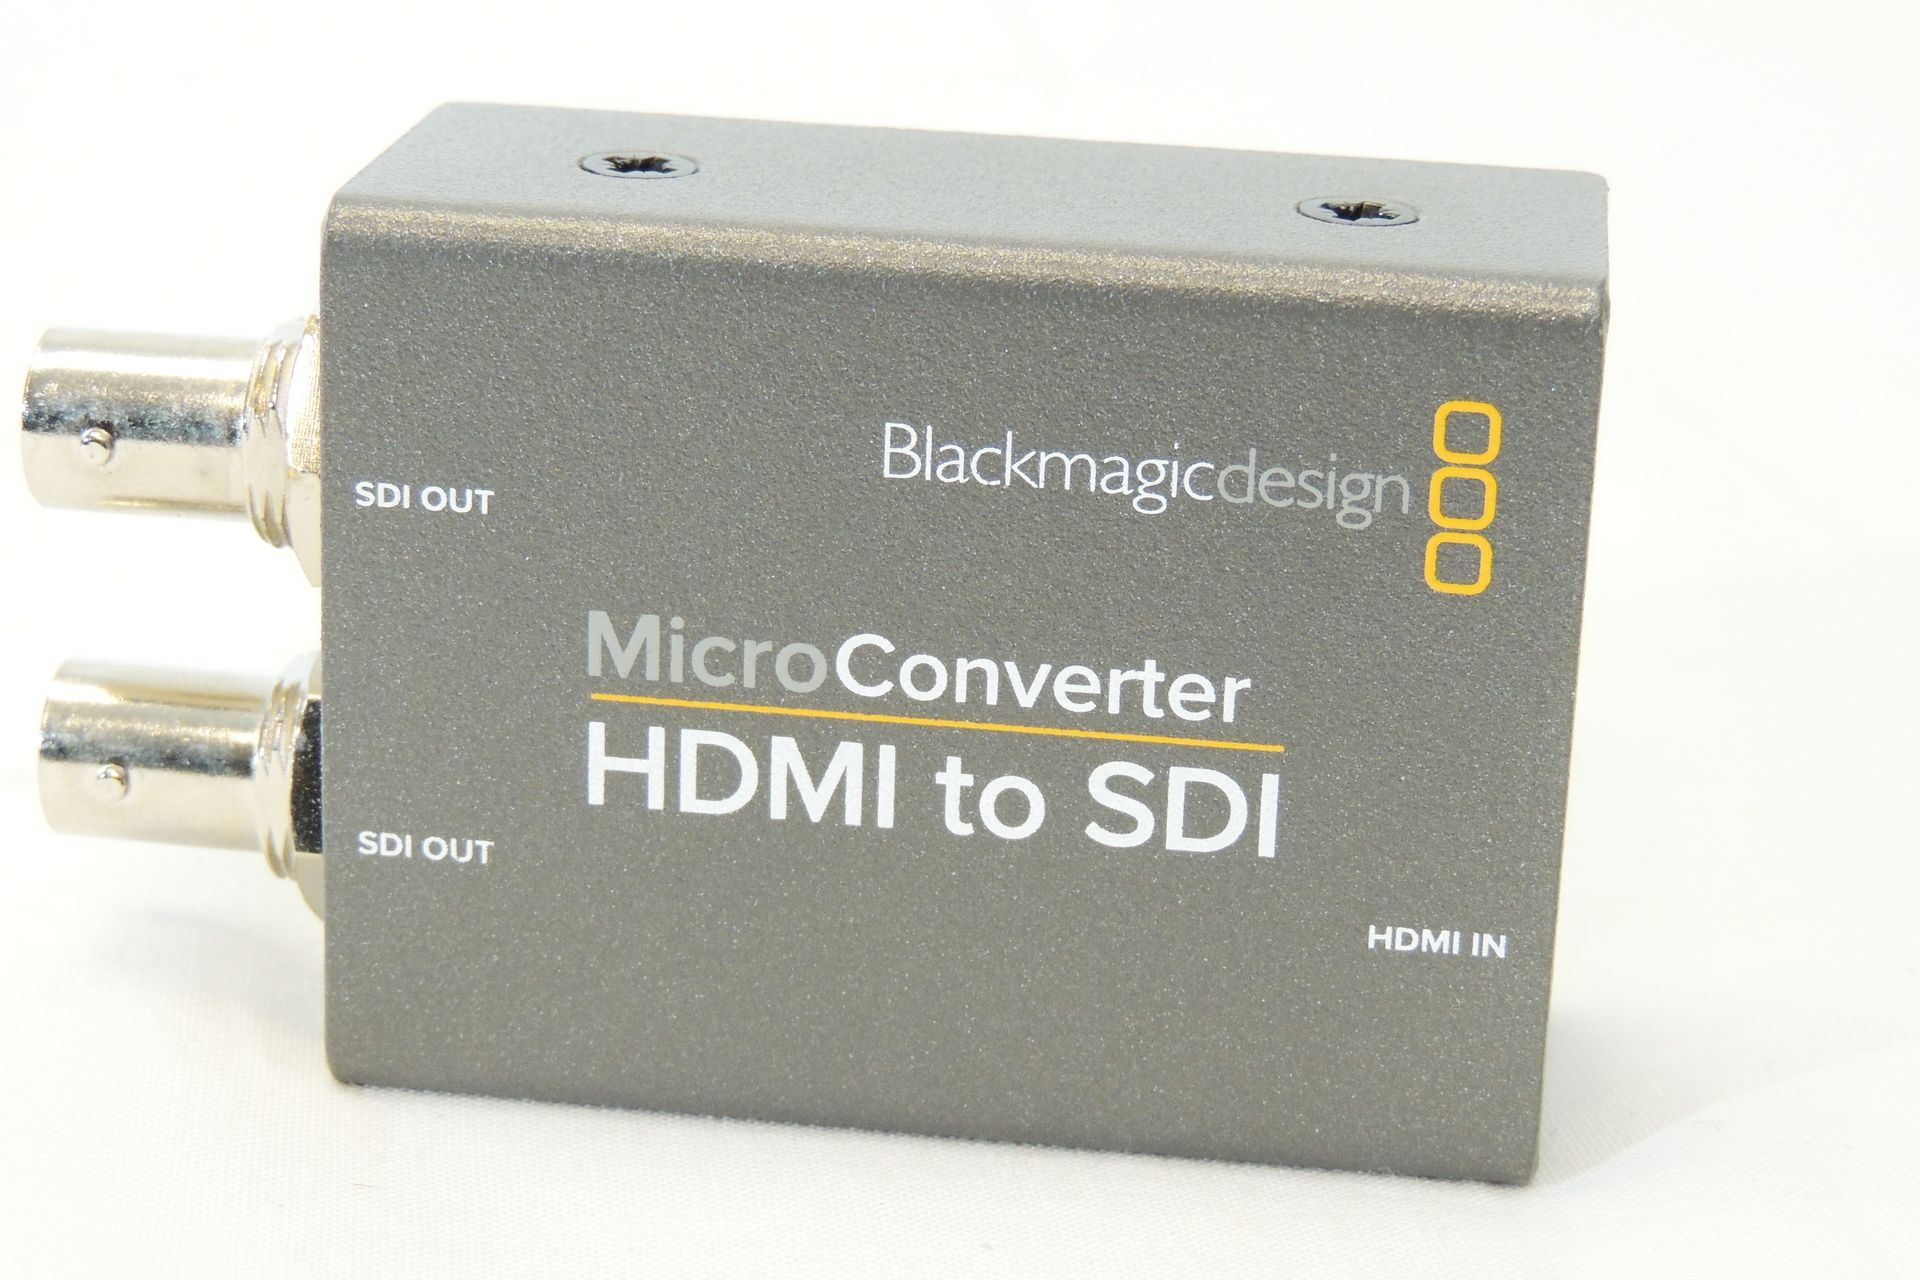 Black Magic Design HDMI to SDI Converter for sale at Plasma Music